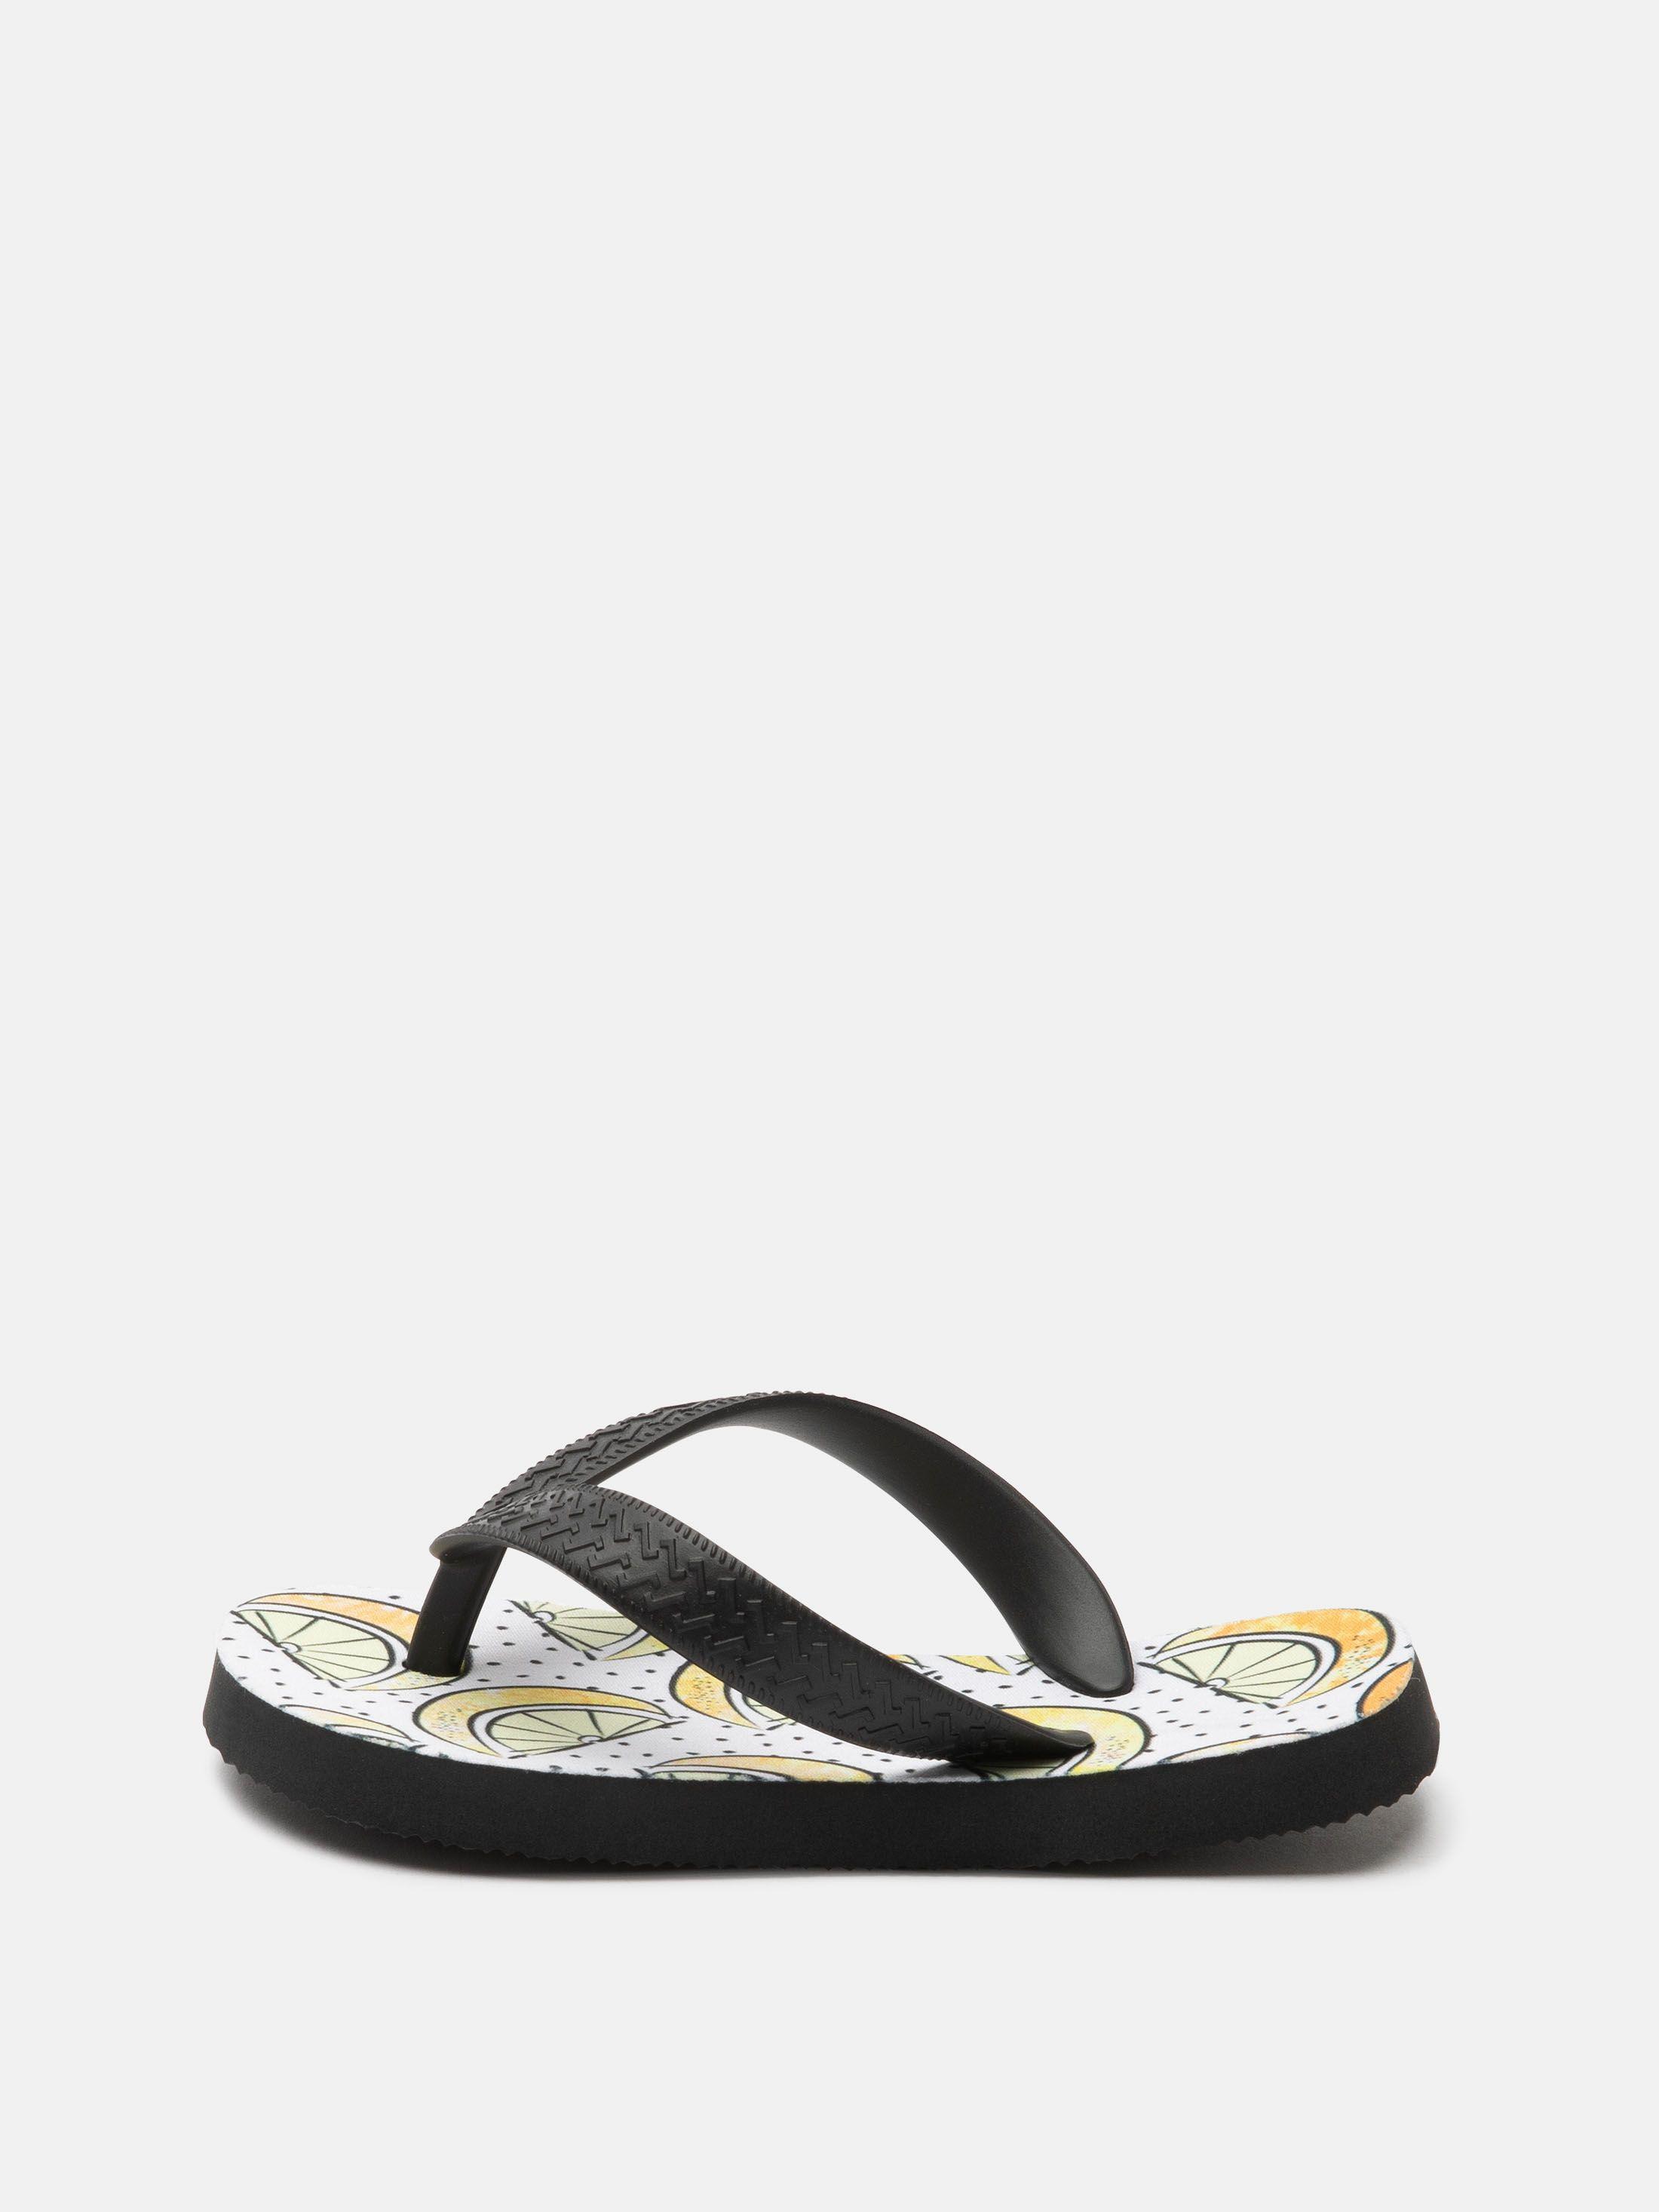 Custom Flip Flops Made